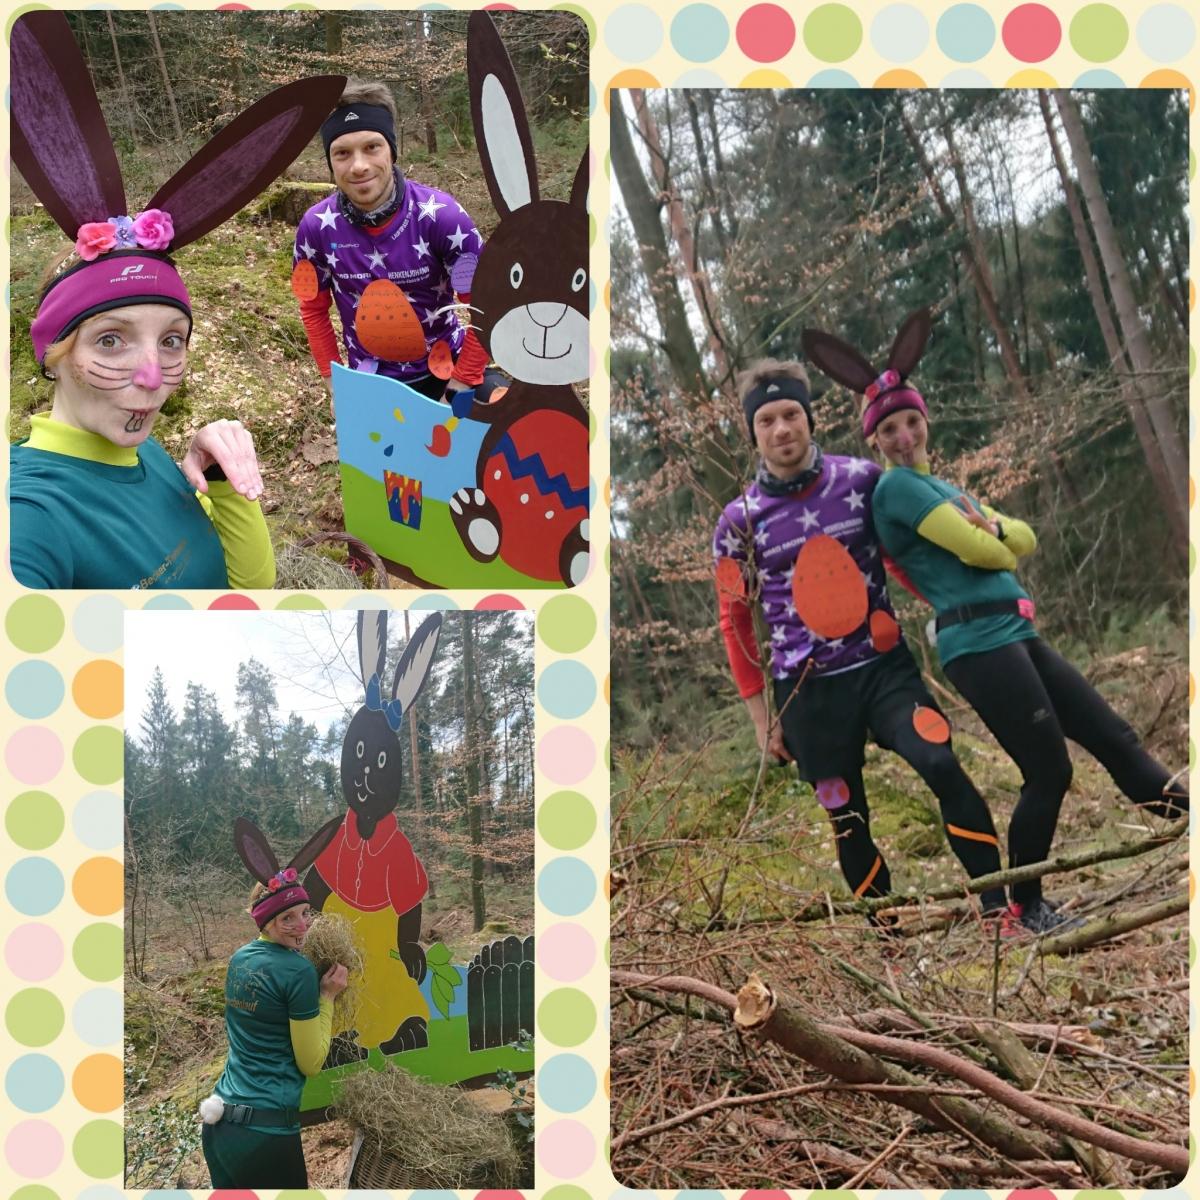 Zipter-Kristina-12-Challenge-Oster-Challenge-r56sl